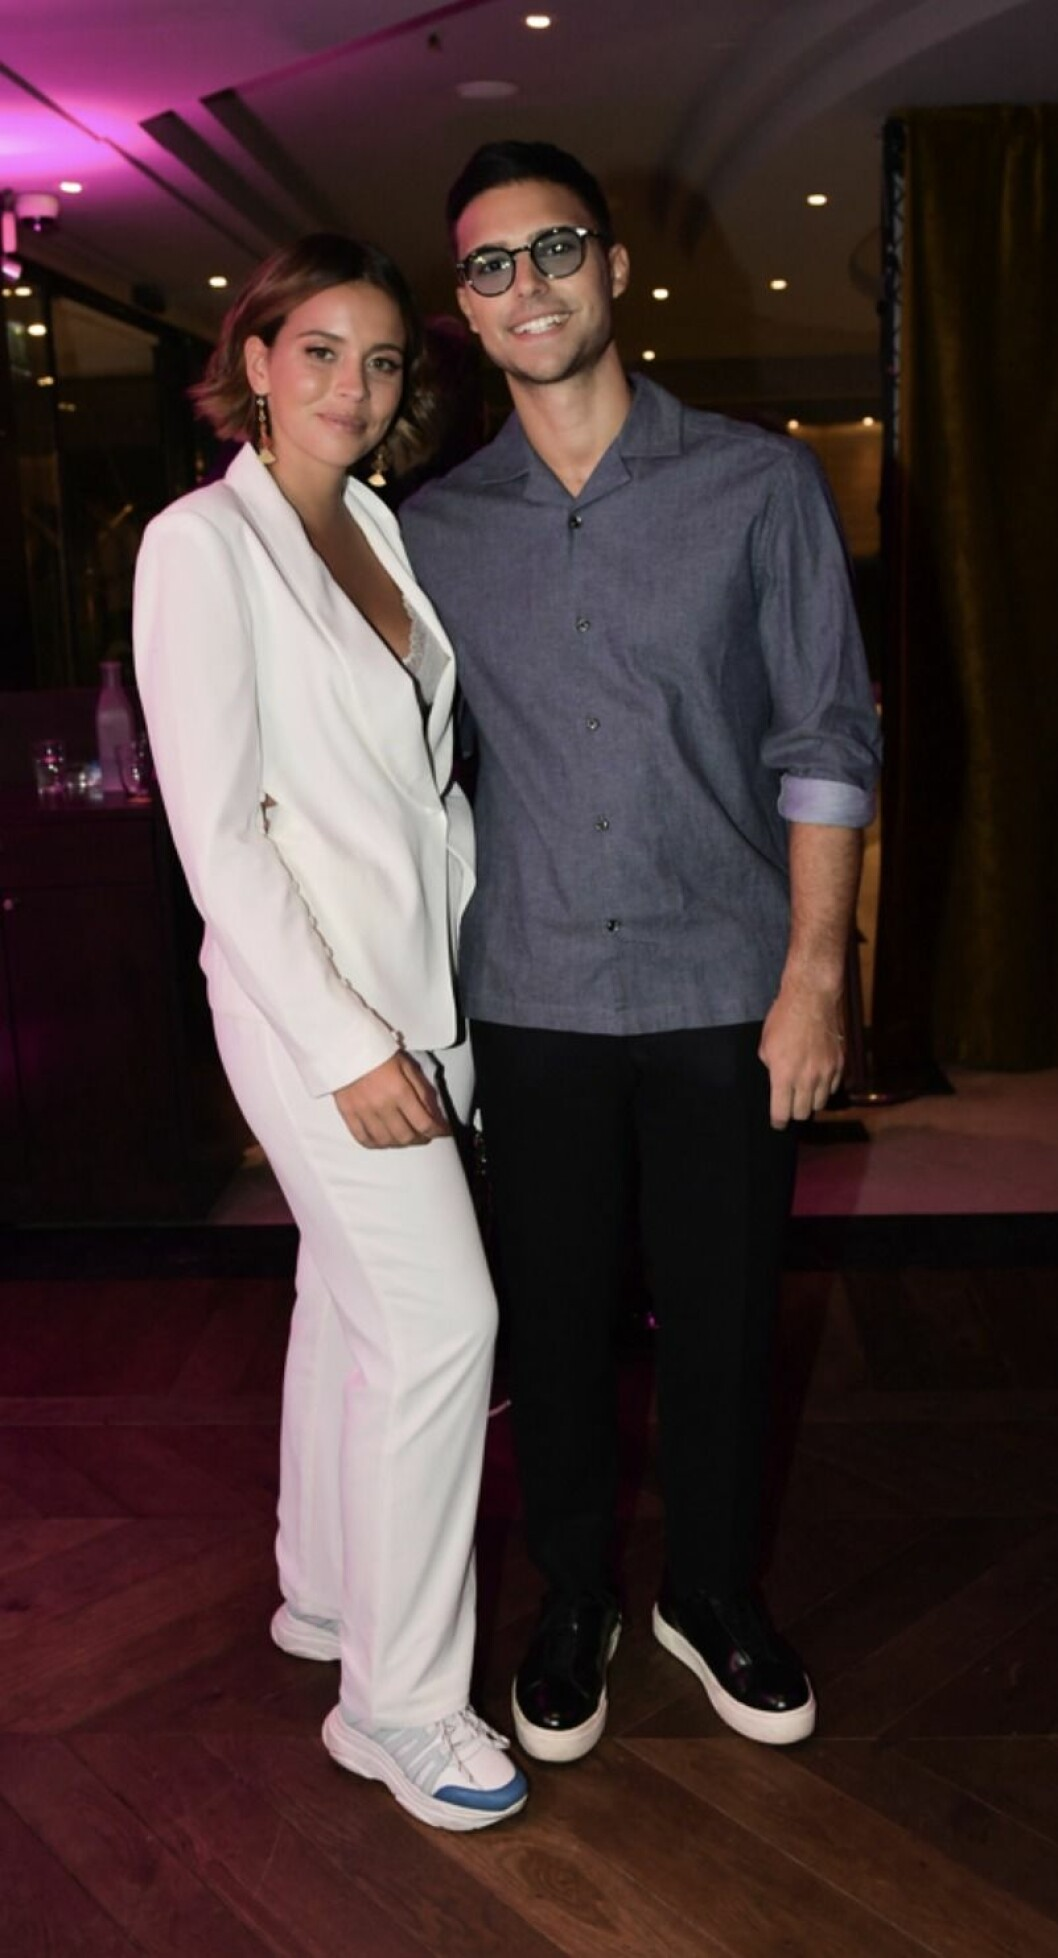 Nicole och Eric Saade